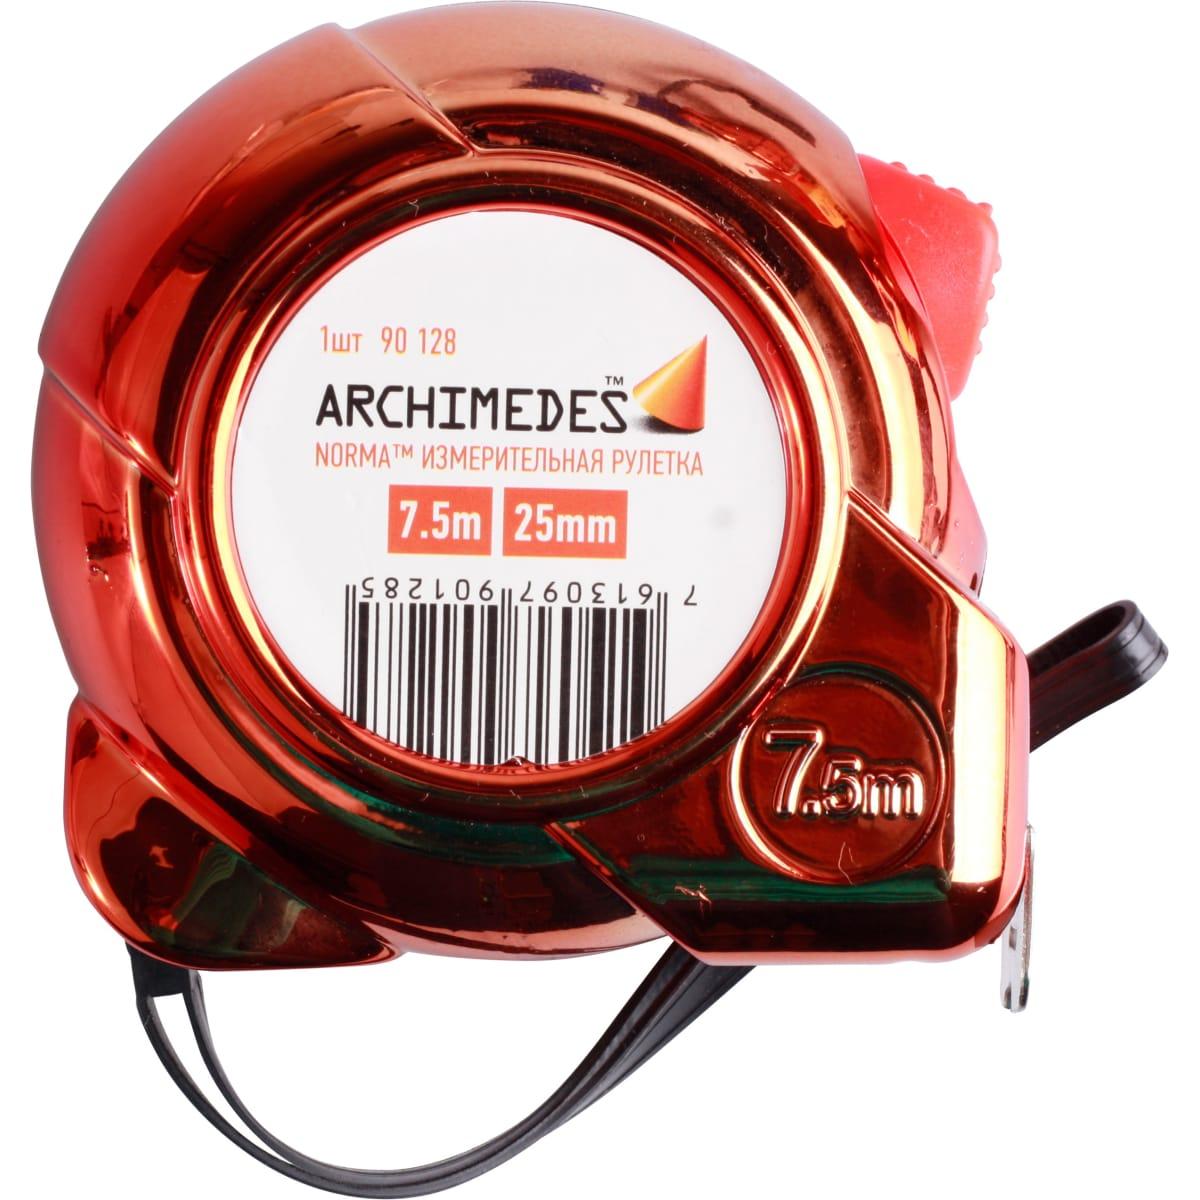 Рулетка ARCHIMEDES 7.5м 90128